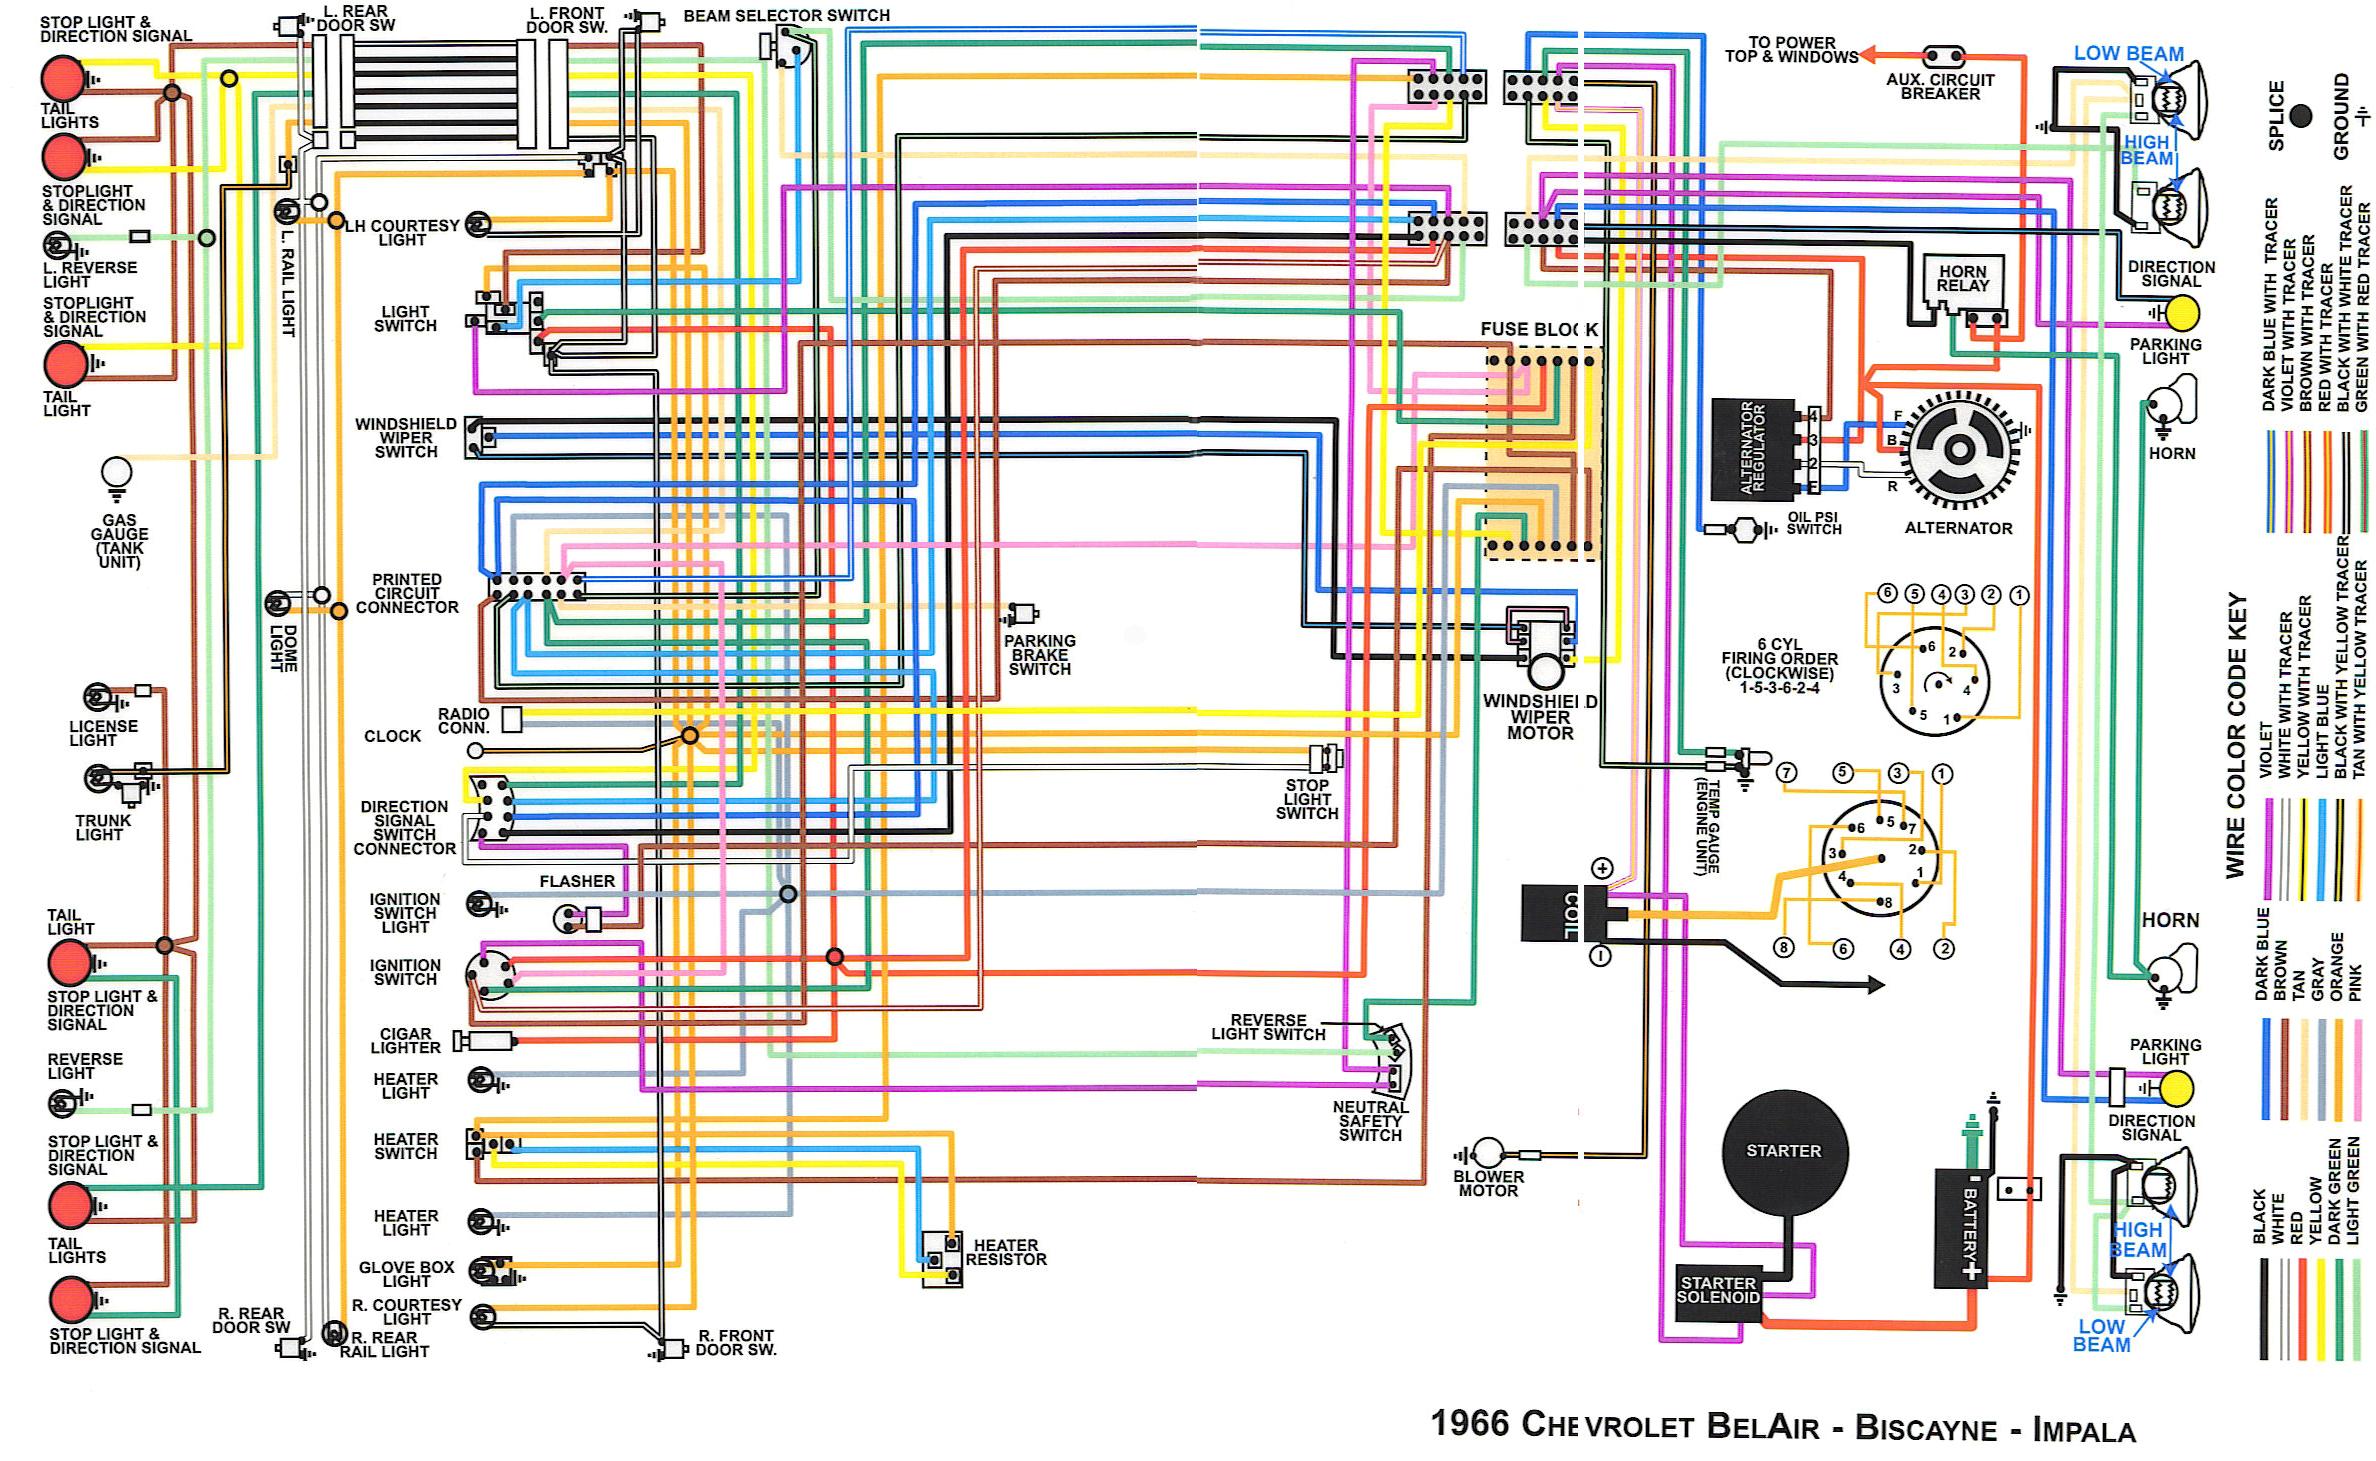 chevy impala radio wiring diagram picture ideas wd honda civic si coupe scosche panel jpg